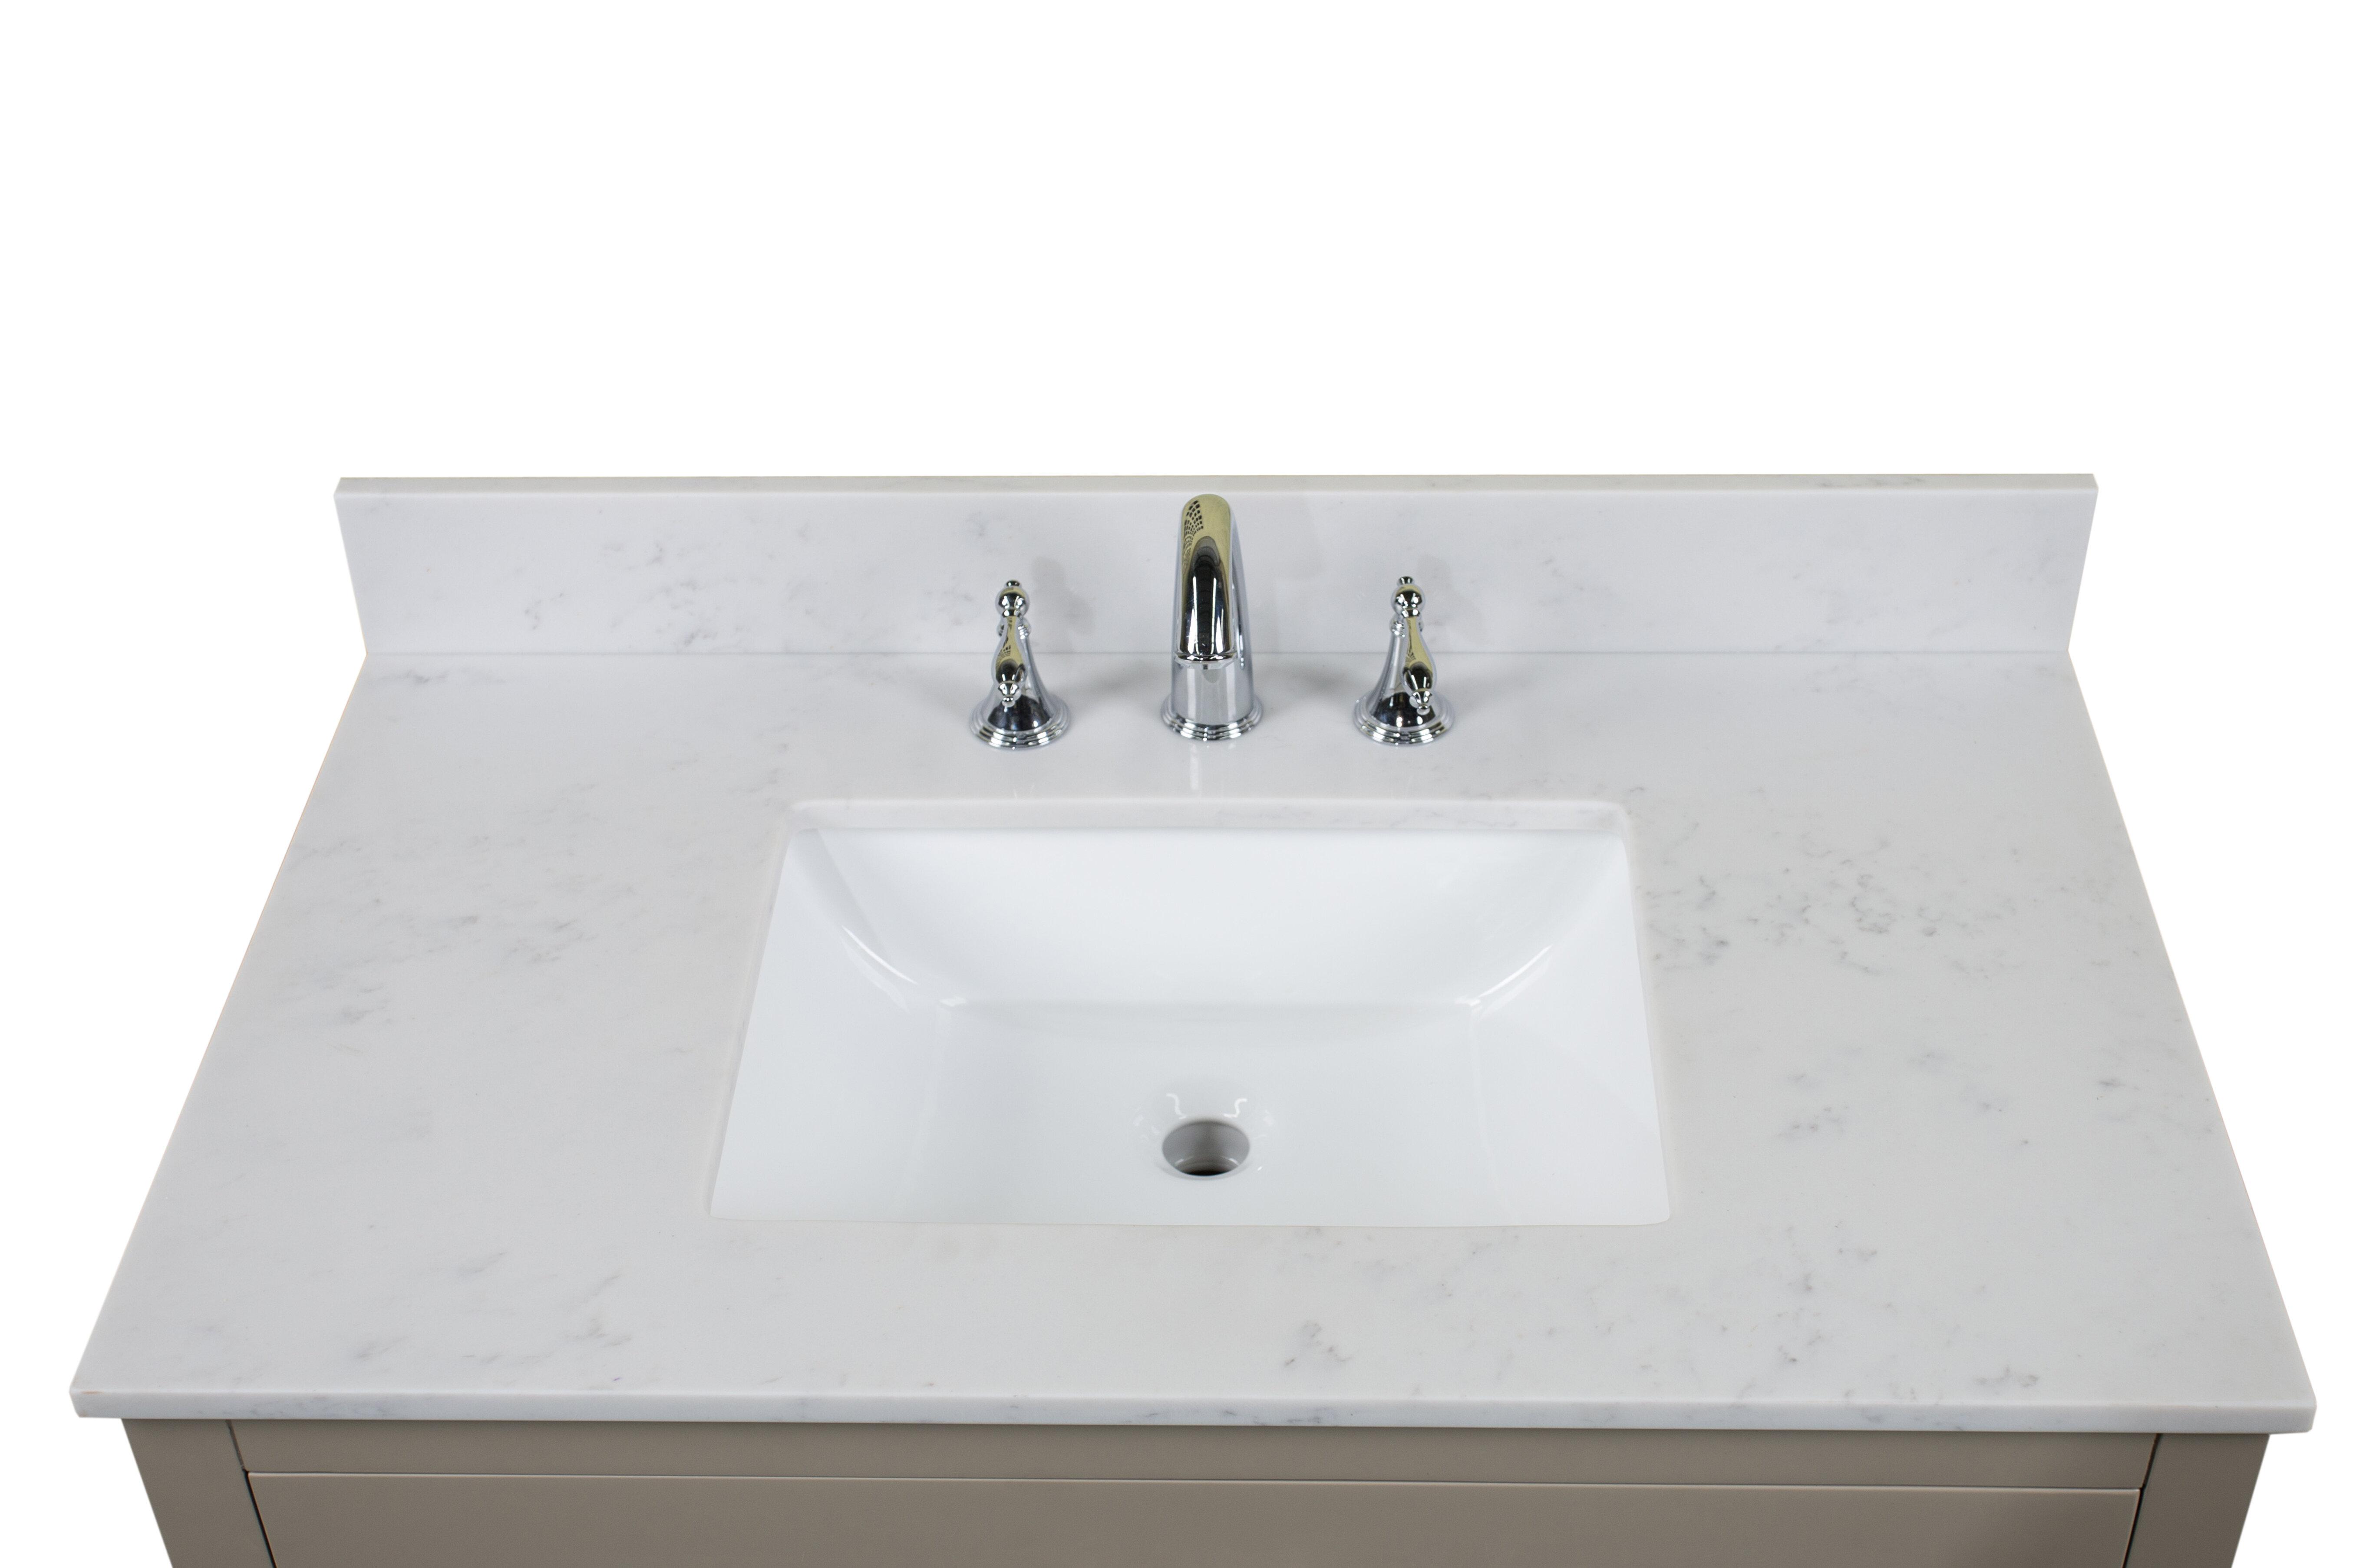 Renaissancevanity Carrara Quartz 37 Single Bathroom Vanity Top Wayfair